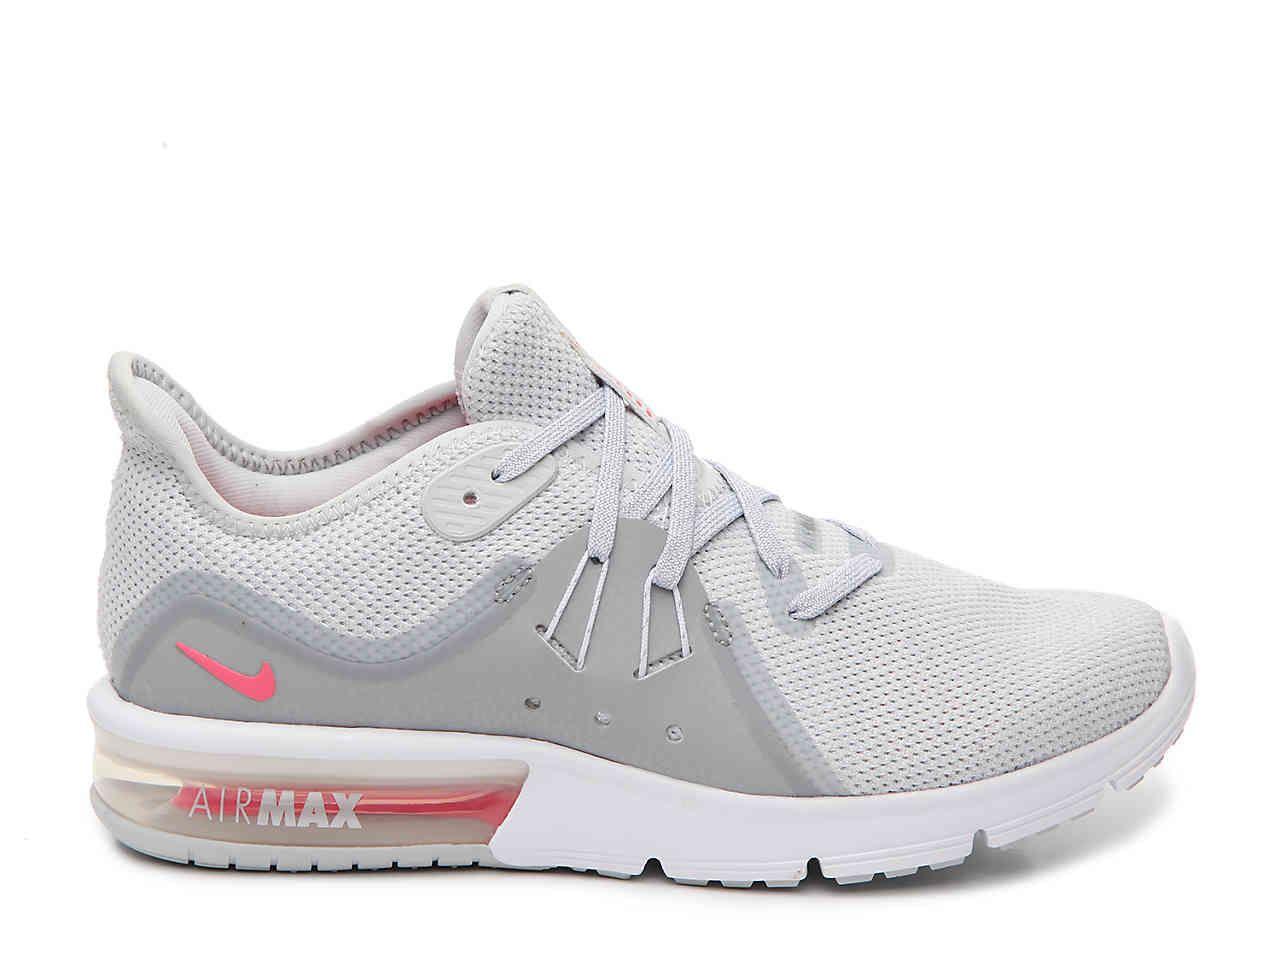 dc6076f3c1 Nike Air Max Sequent 3 Lightweight Running Shoe - Women's Women's Shoes |  DSW